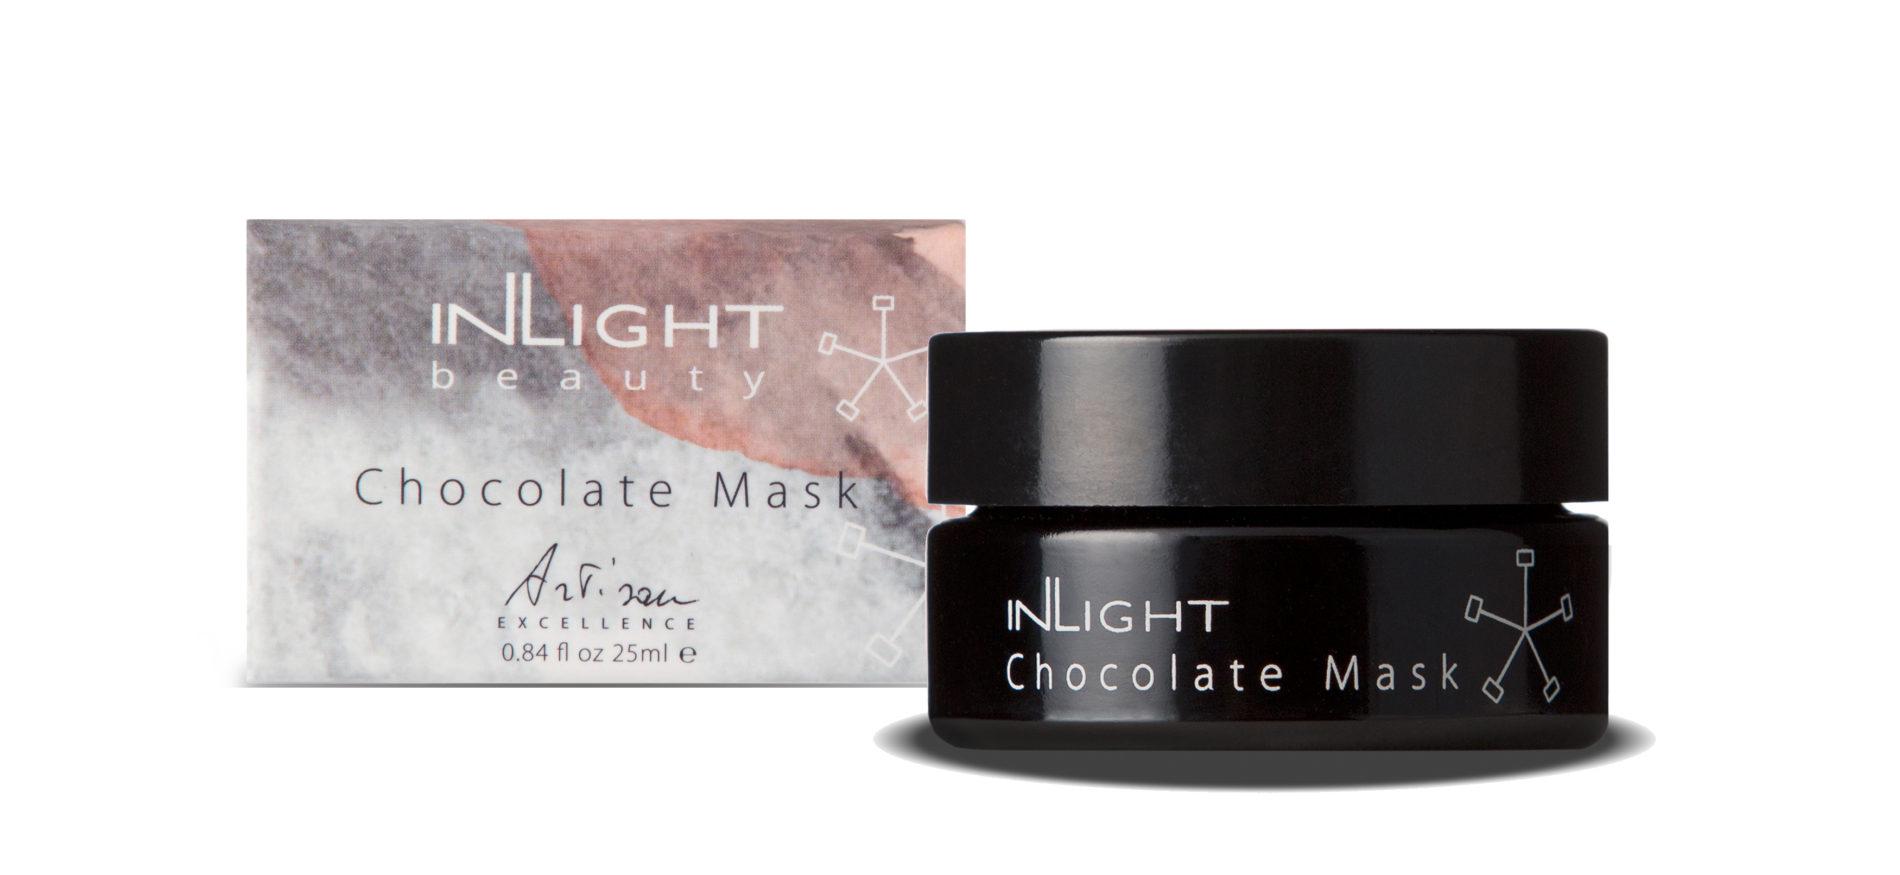 Inlight Beauty's Chocolate Mask